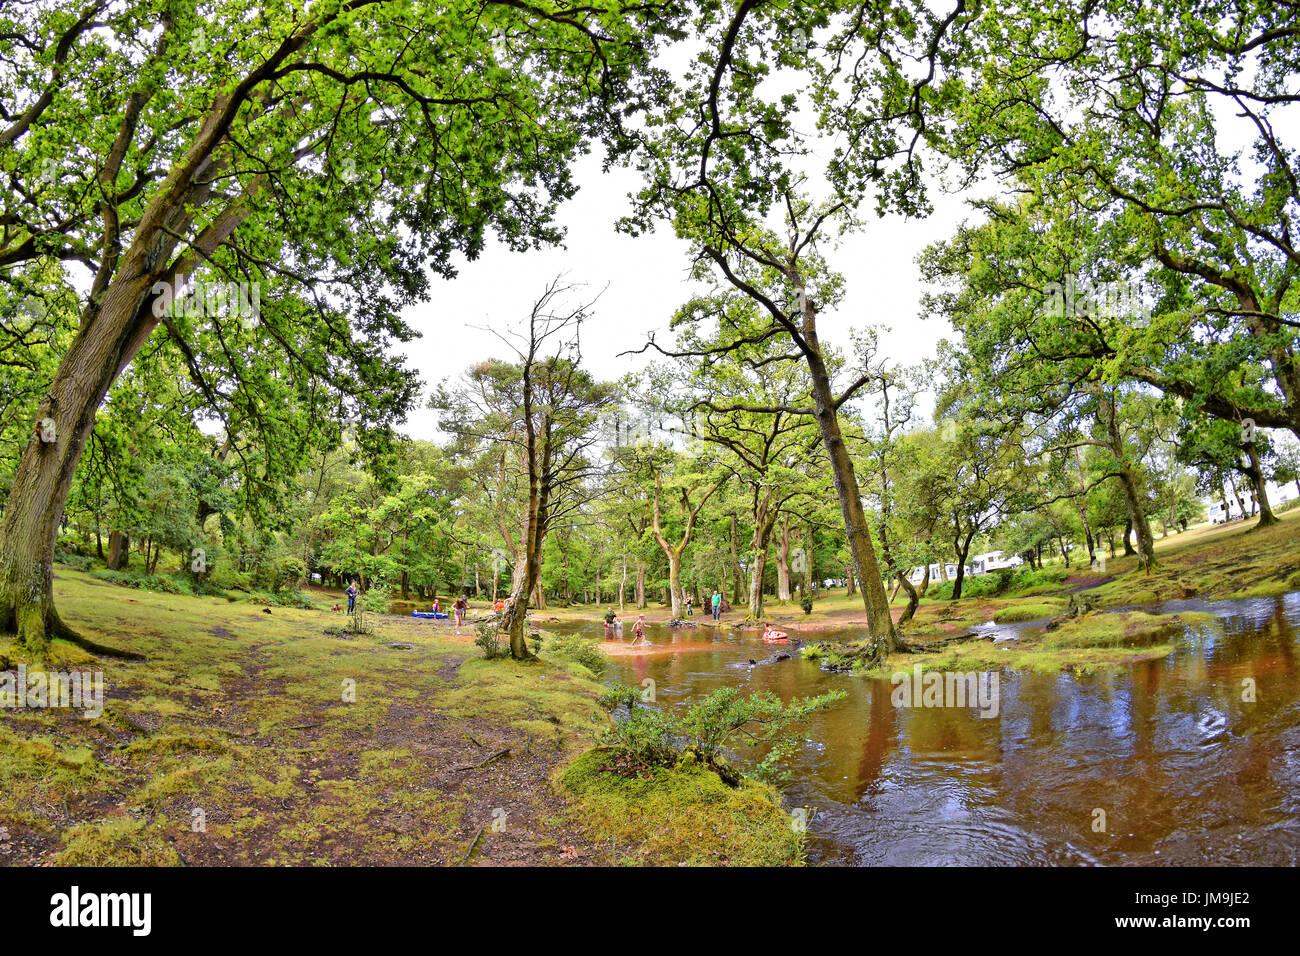 "Children playing in a New Forest stream ""Ober Water"" next to Aldridge Hill Caravan Park and Campsite near Brockenhurst, Stock Photo"